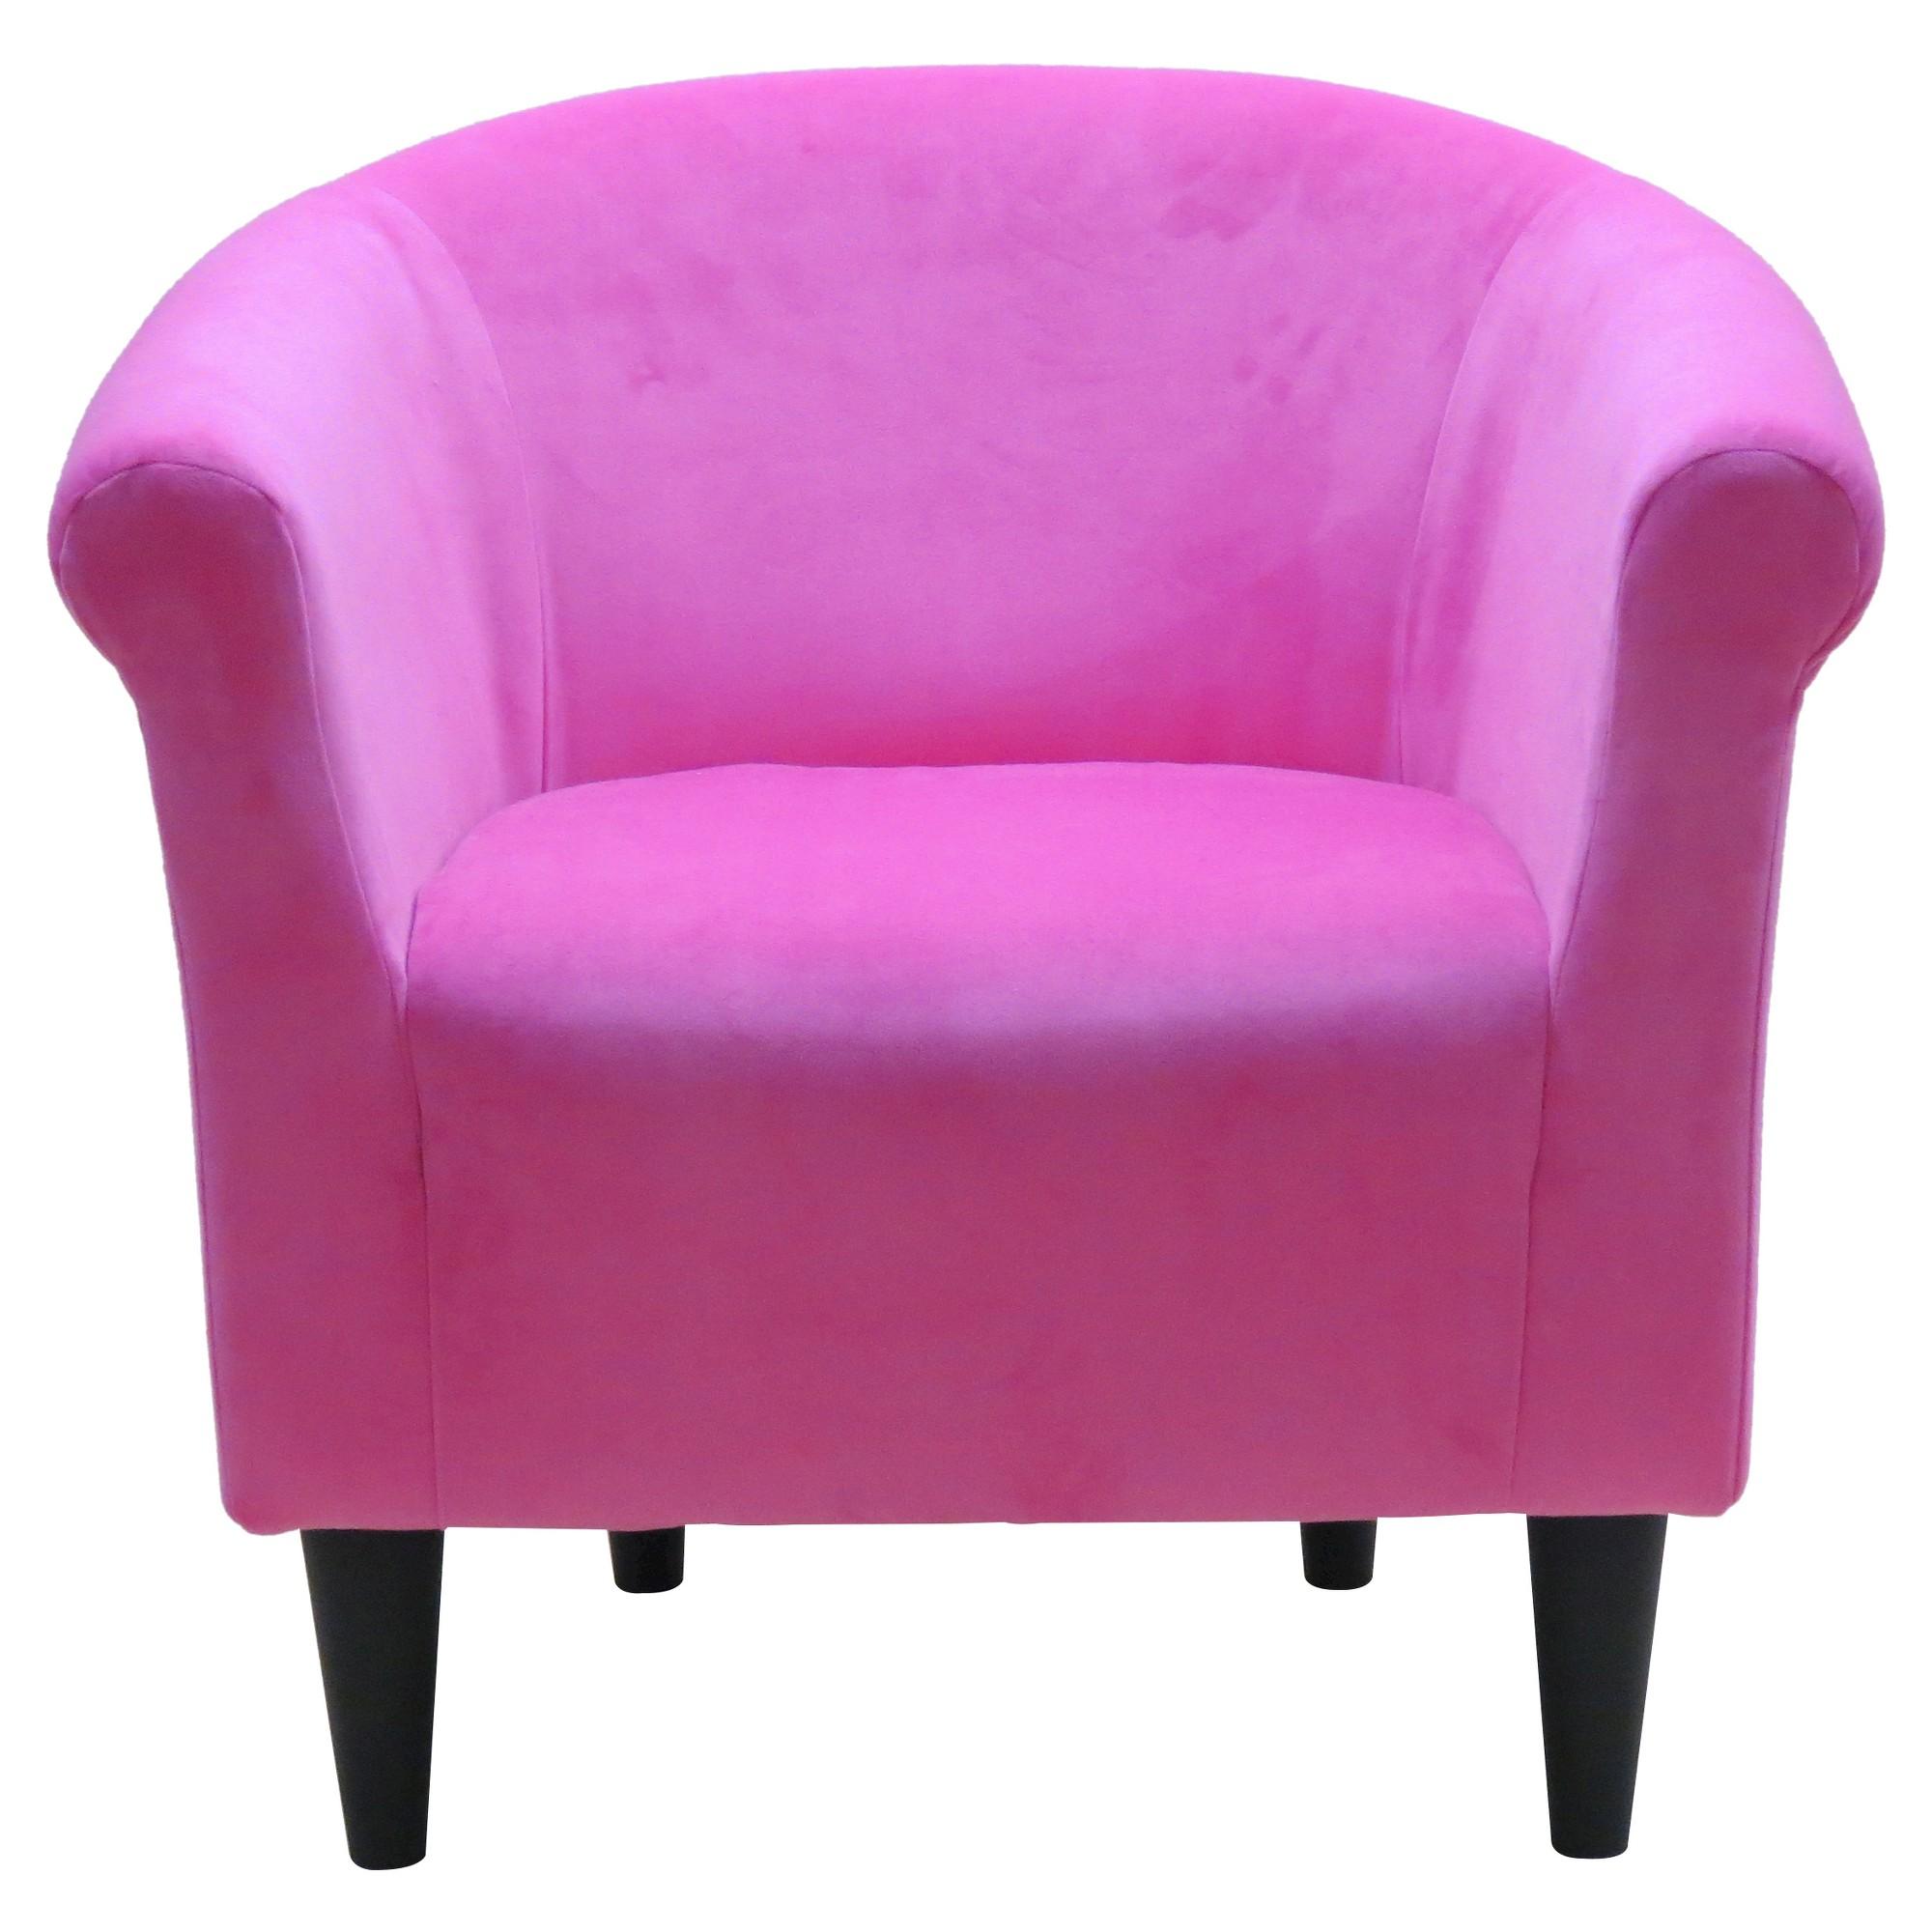 Savannah Club Chair   Hexi Blue   Bubble Gum Pink, Gumball Pink